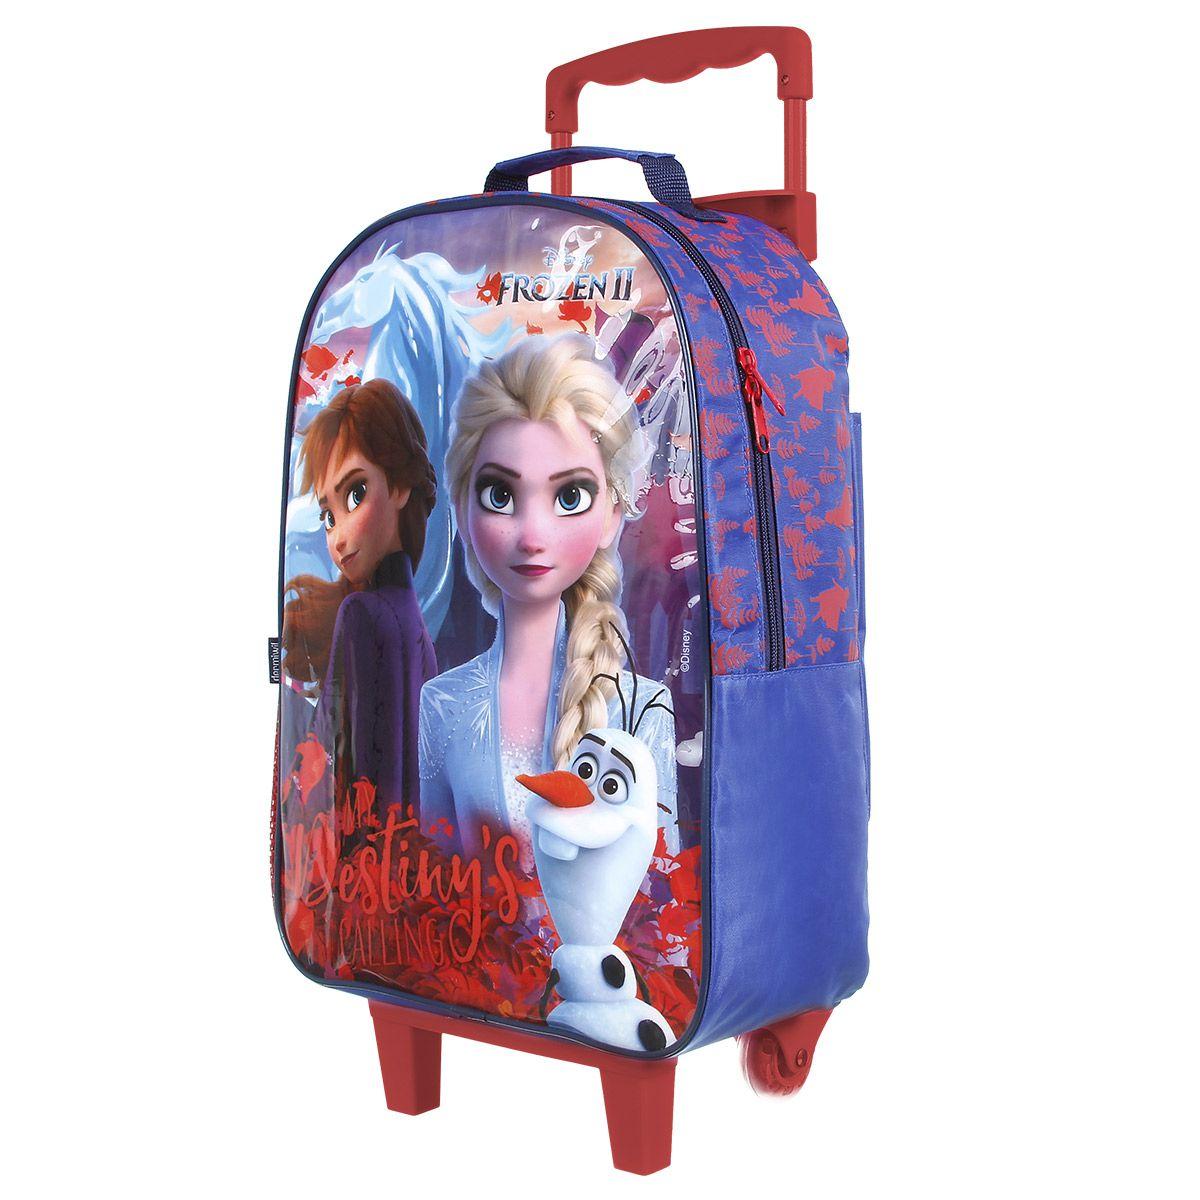 Kit Mochilete Escolar Frozen II My Destiny is Calling Disney + Estojo